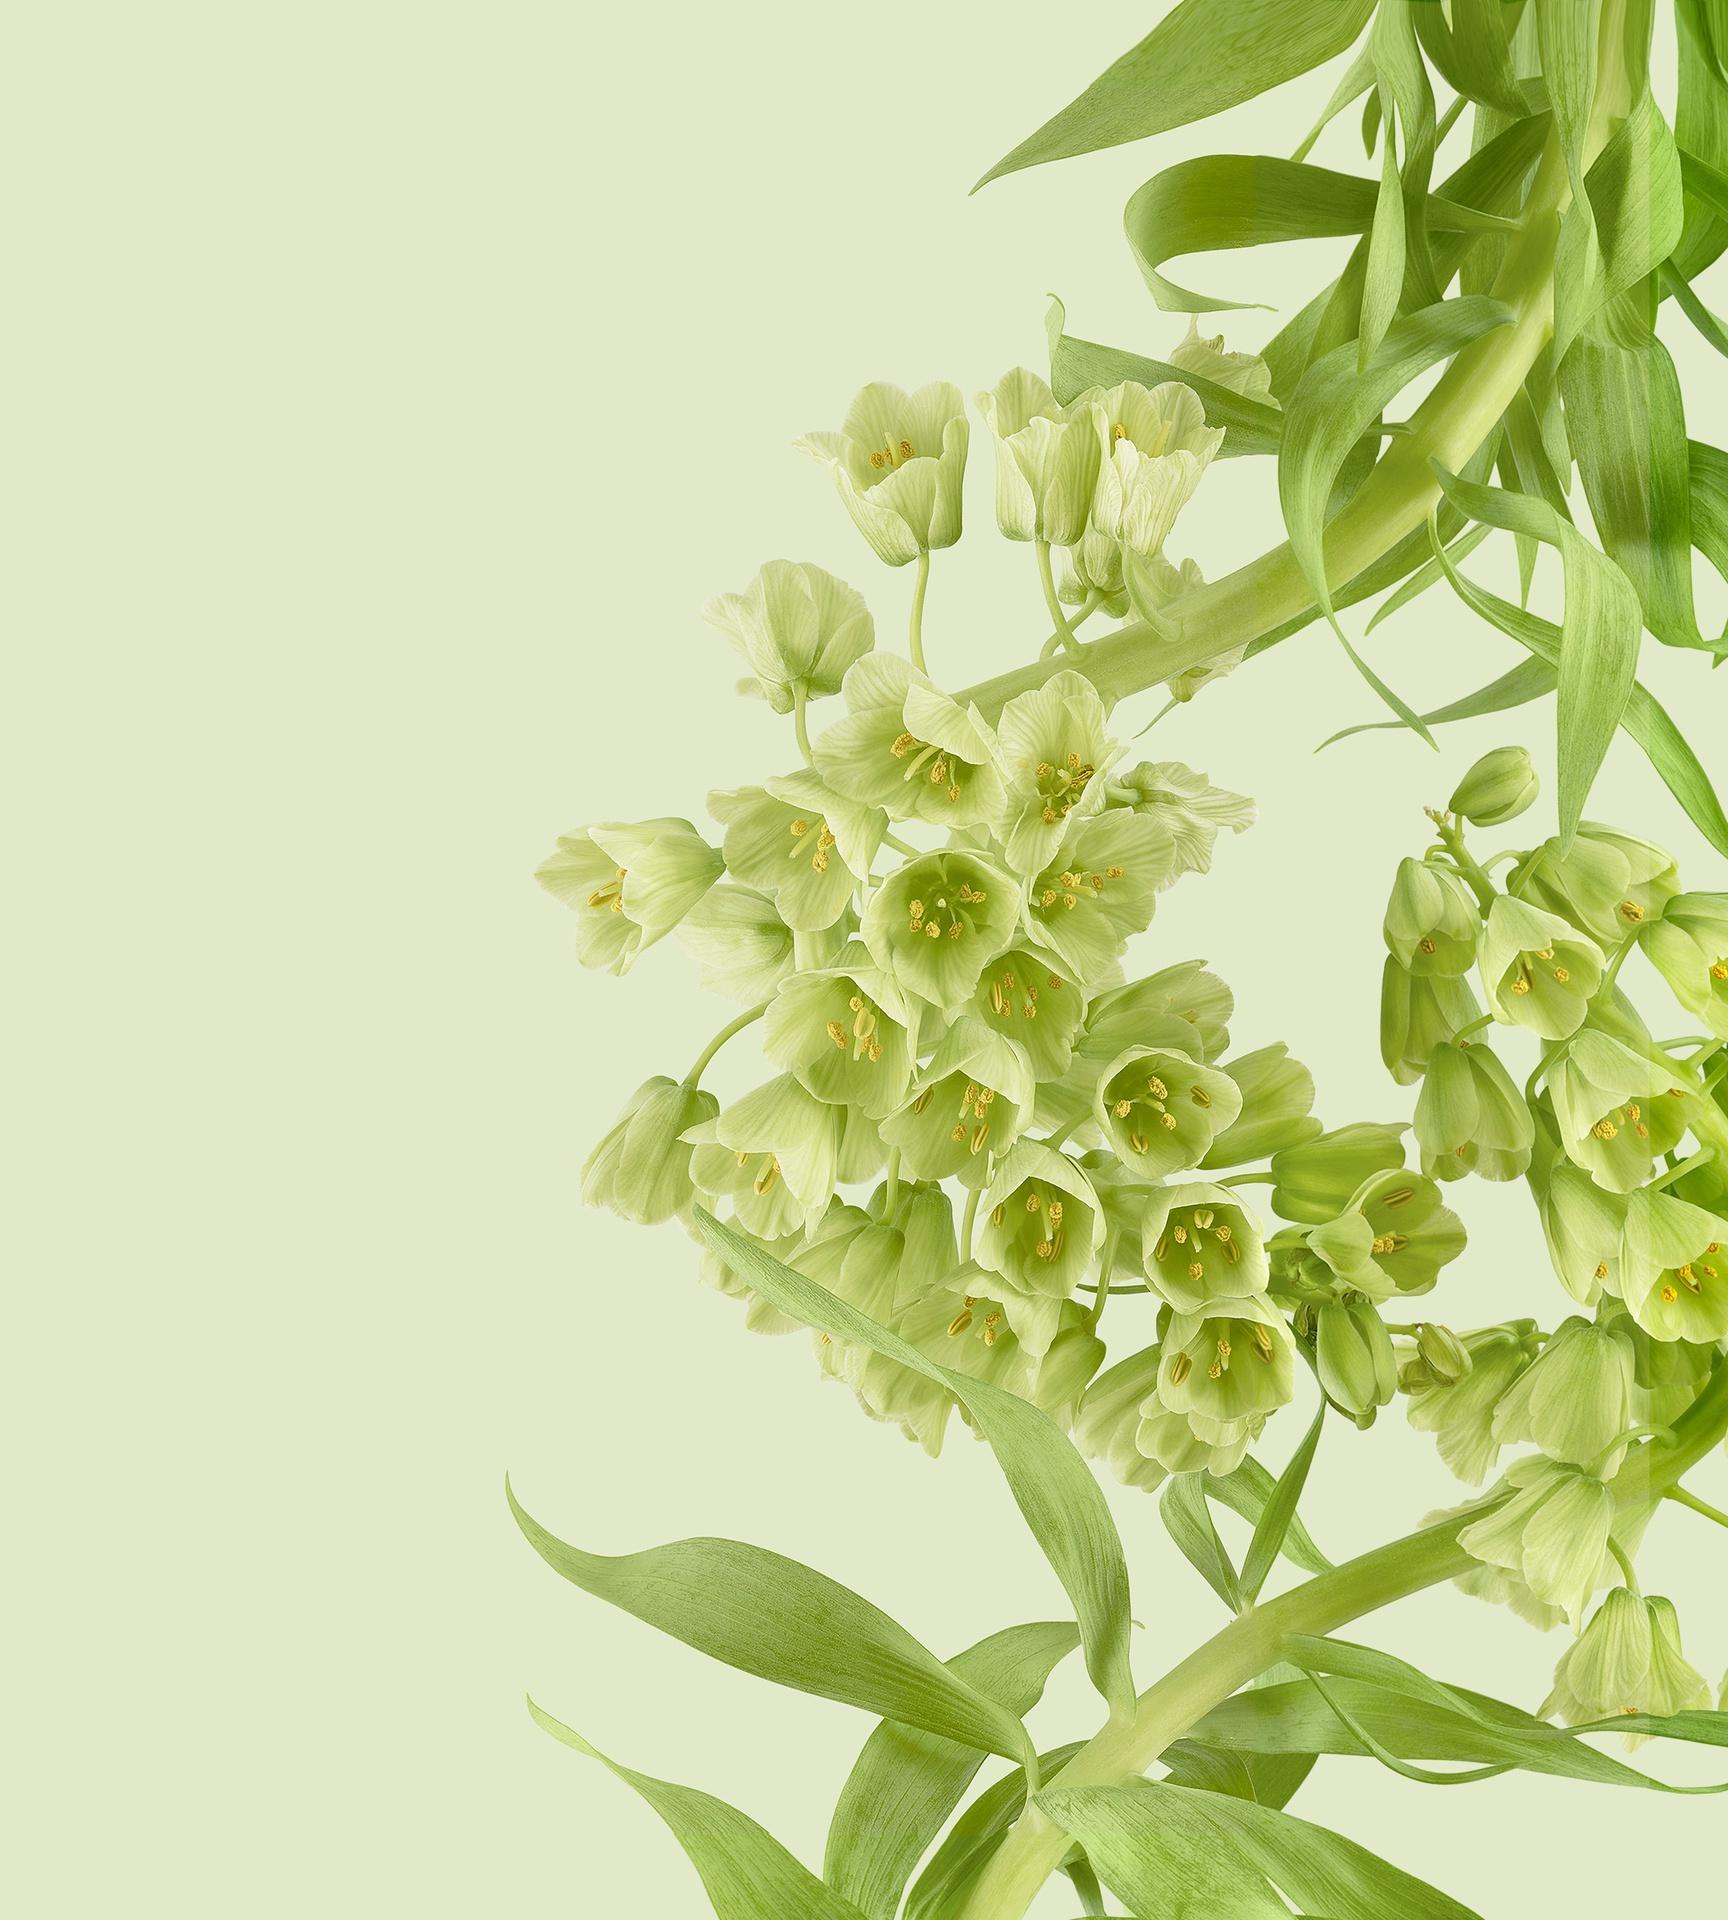 Pixel 6 Pro Wallpaper Persian Lily light by Andrew Zuckerman